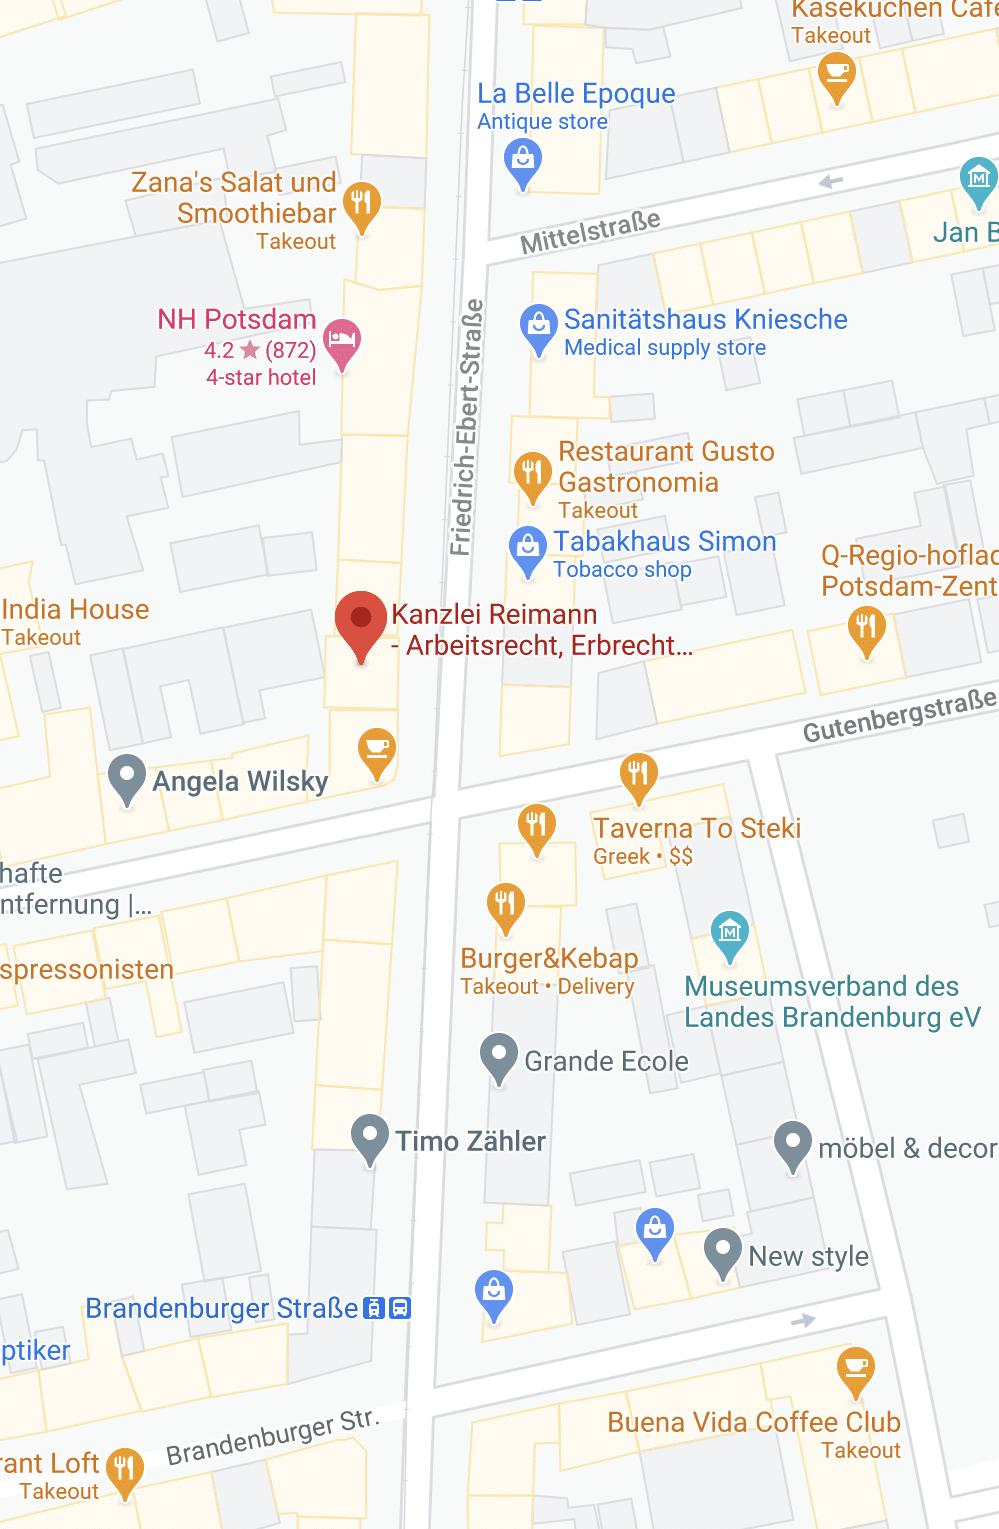 Adresse Kanzlei Reimann Potsdam